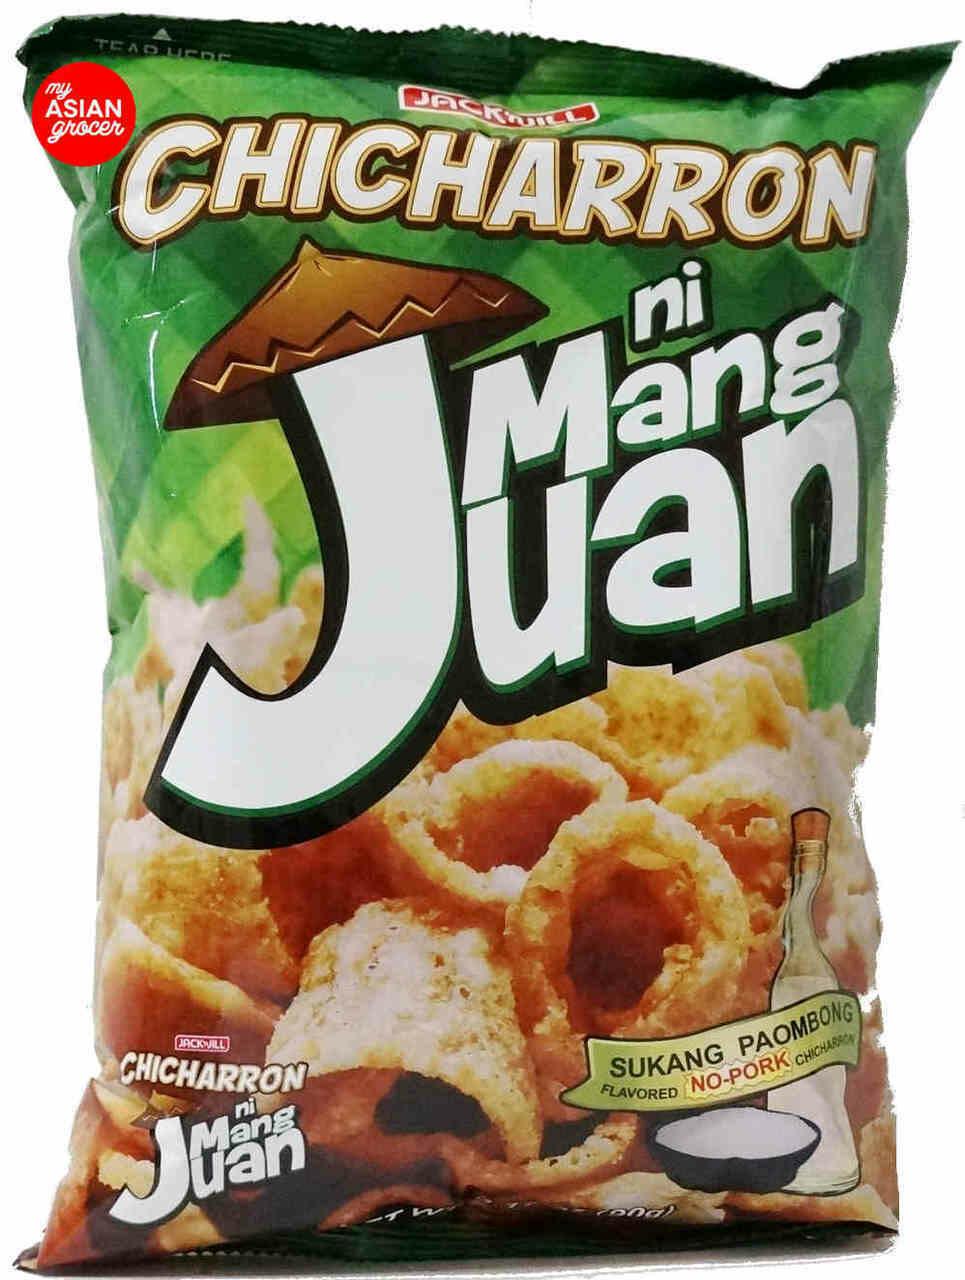 Chicharron NI MANG JUAN PAOMBONG 90g